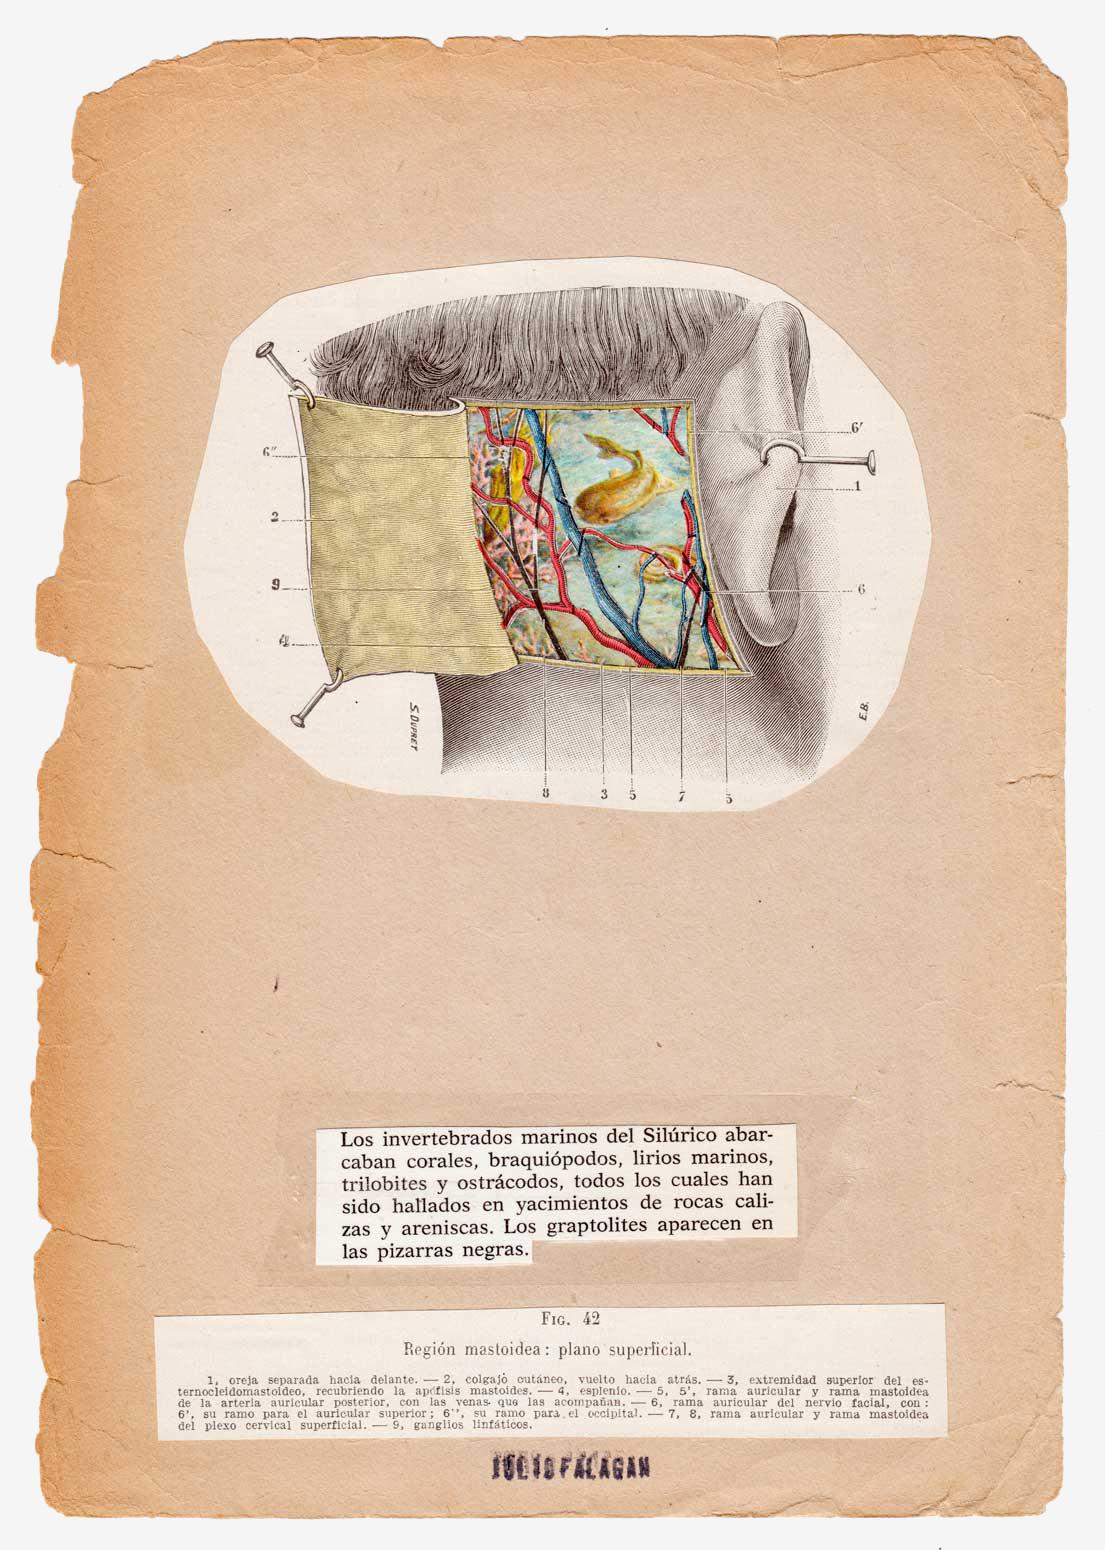 anatomia-silvestre-siluro-julio-falagan